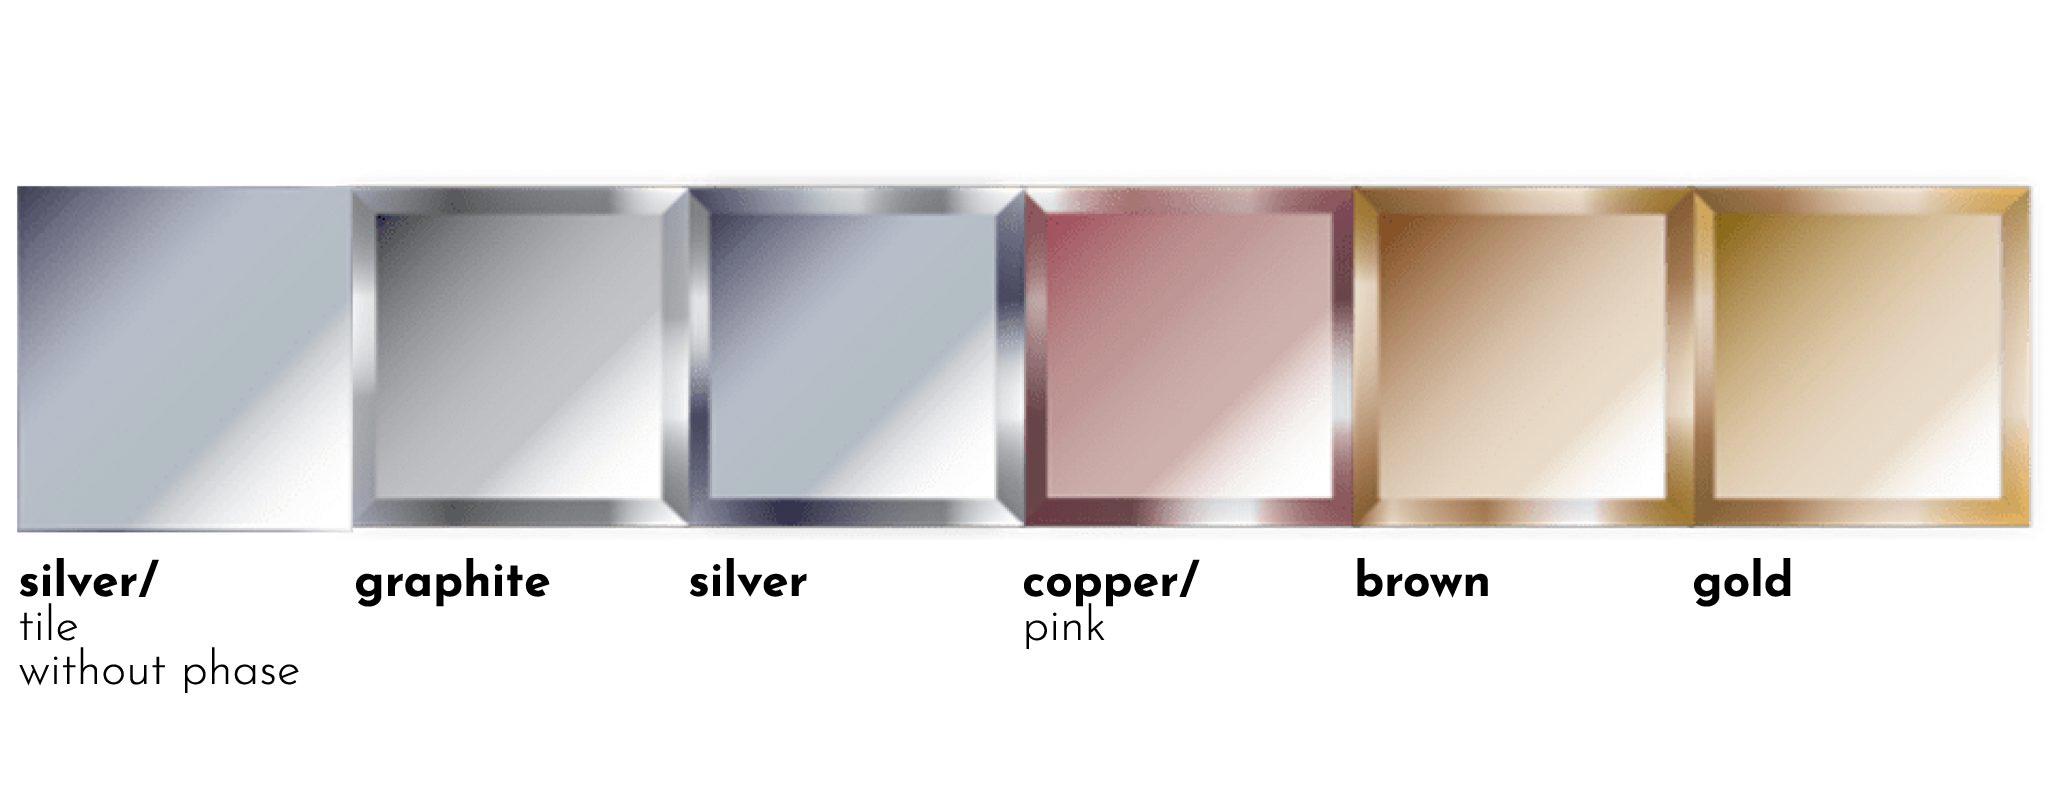 colors_mirror_tiles_